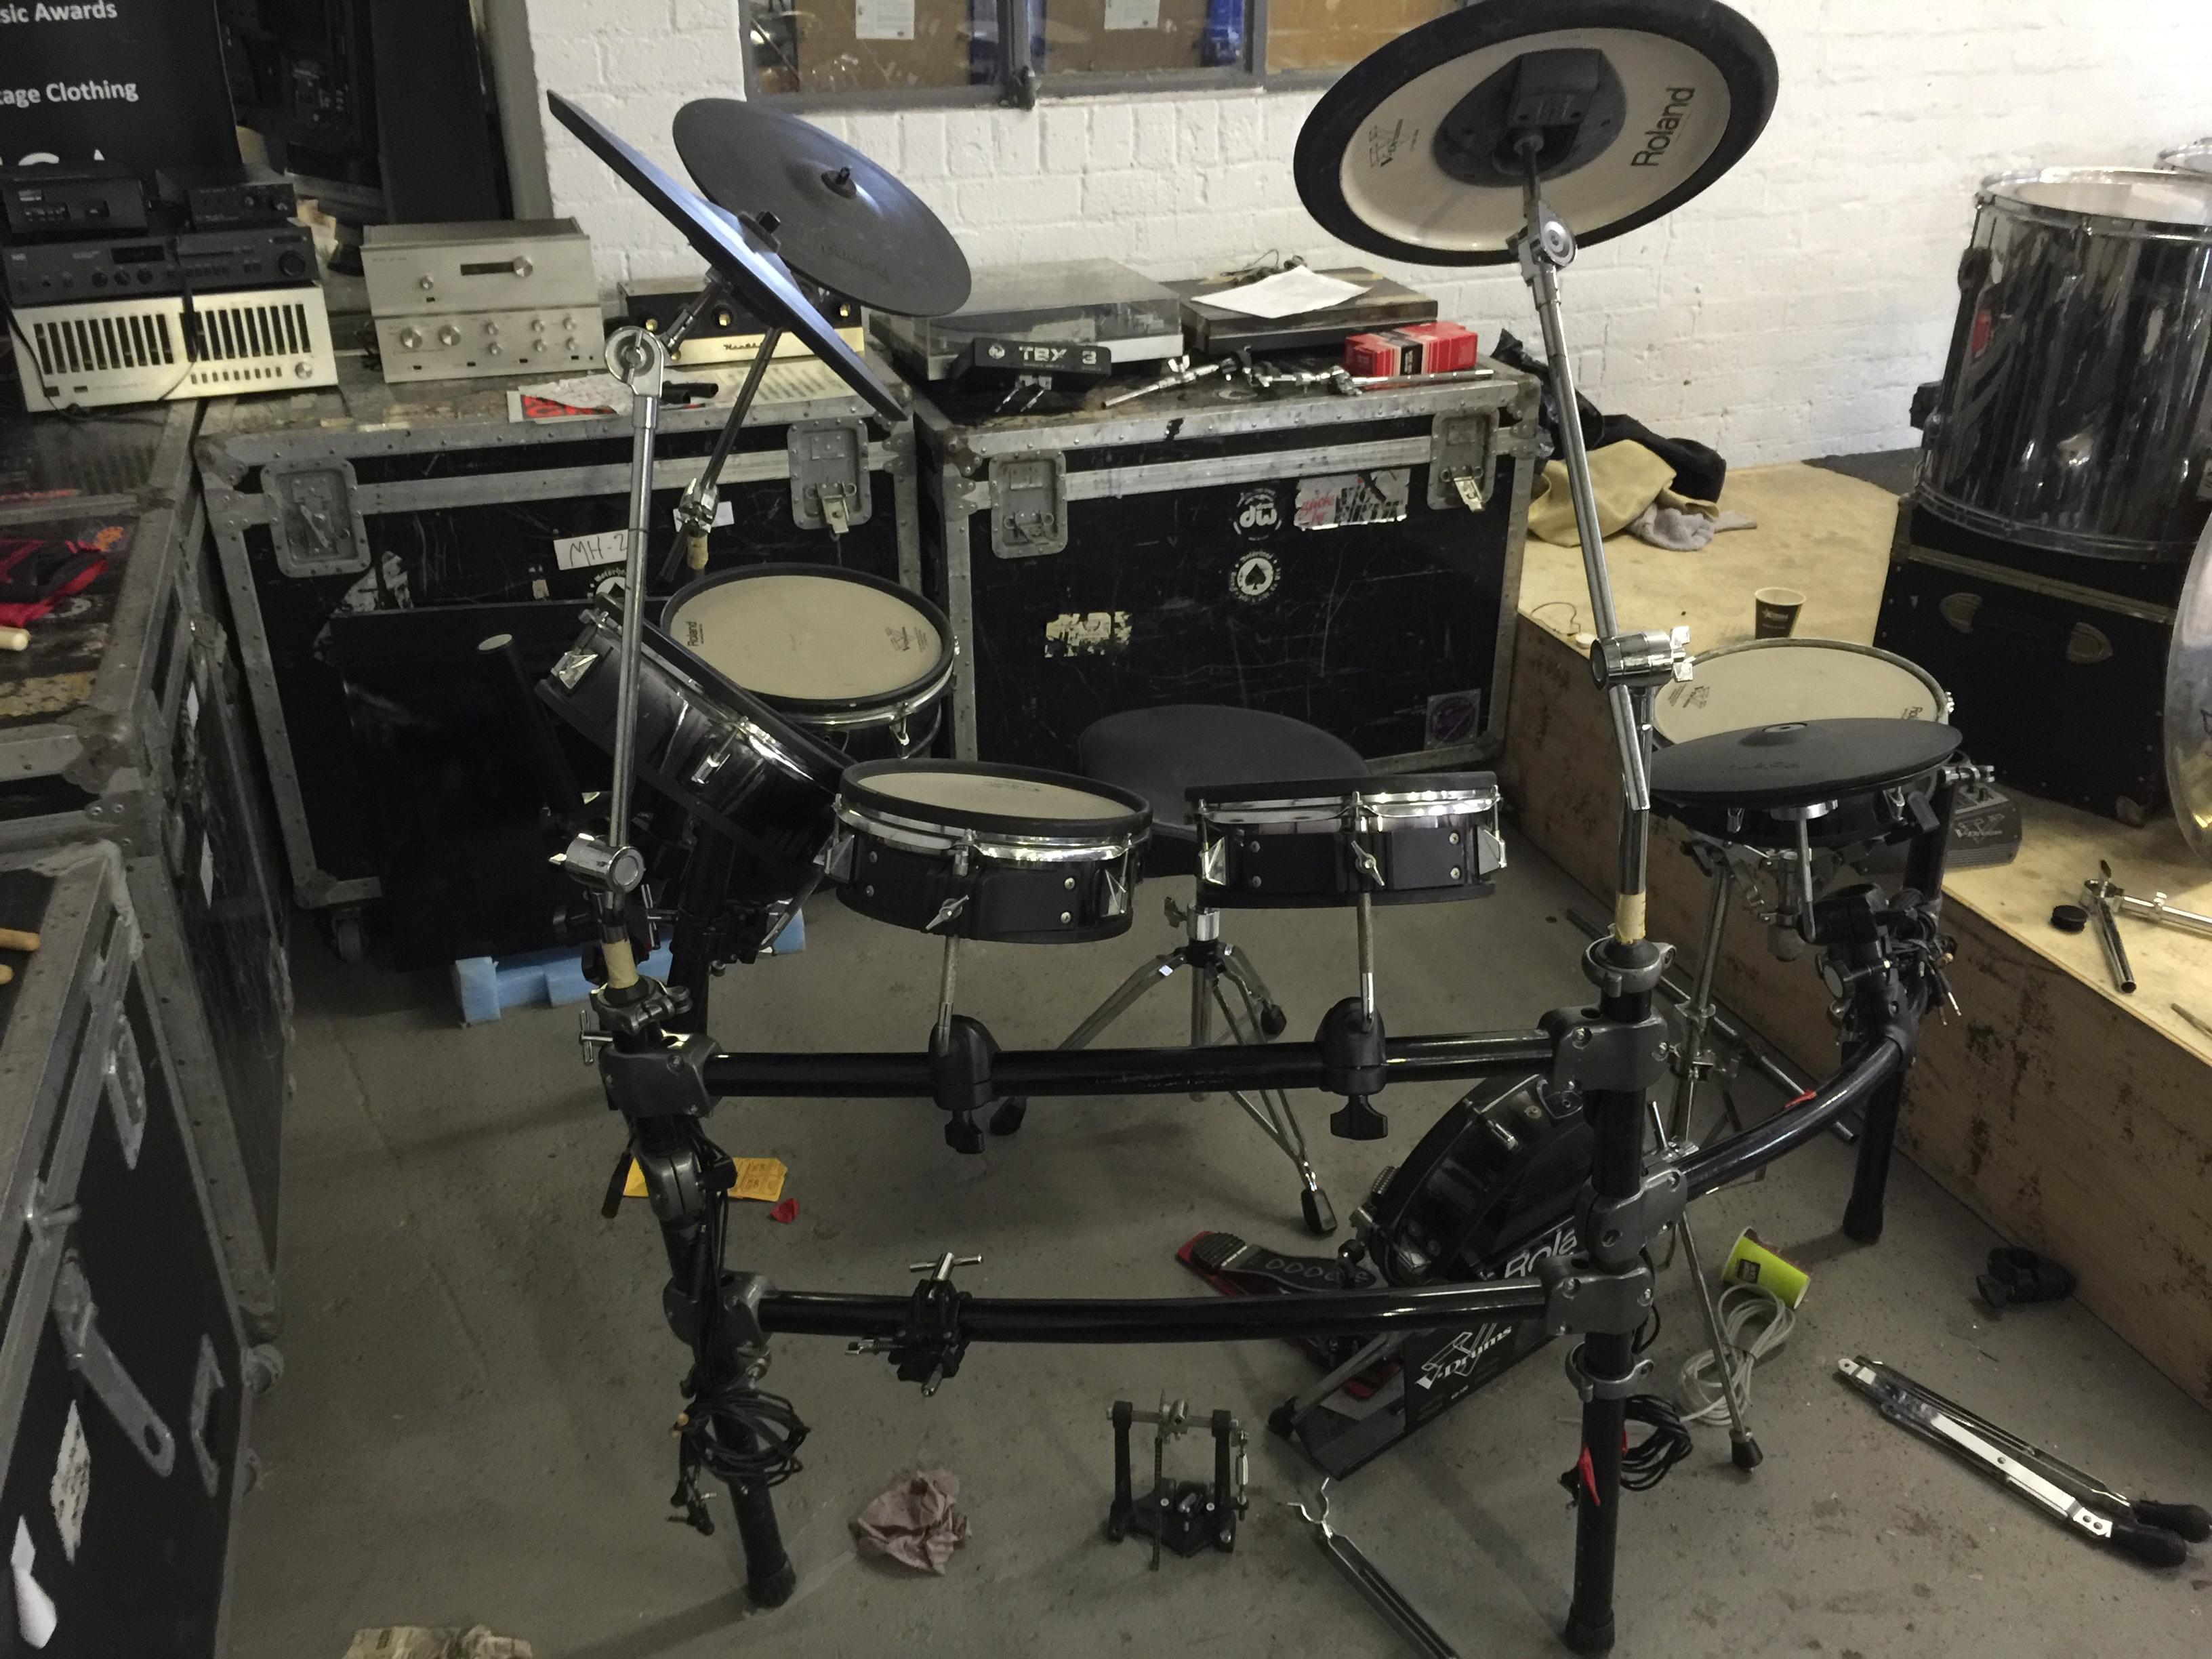 MOTORHEAD & PHILTHY ANIMAL - Phil's Roland TD20 V-Pro Series Electronic Drum Kit. - Image 3 of 5